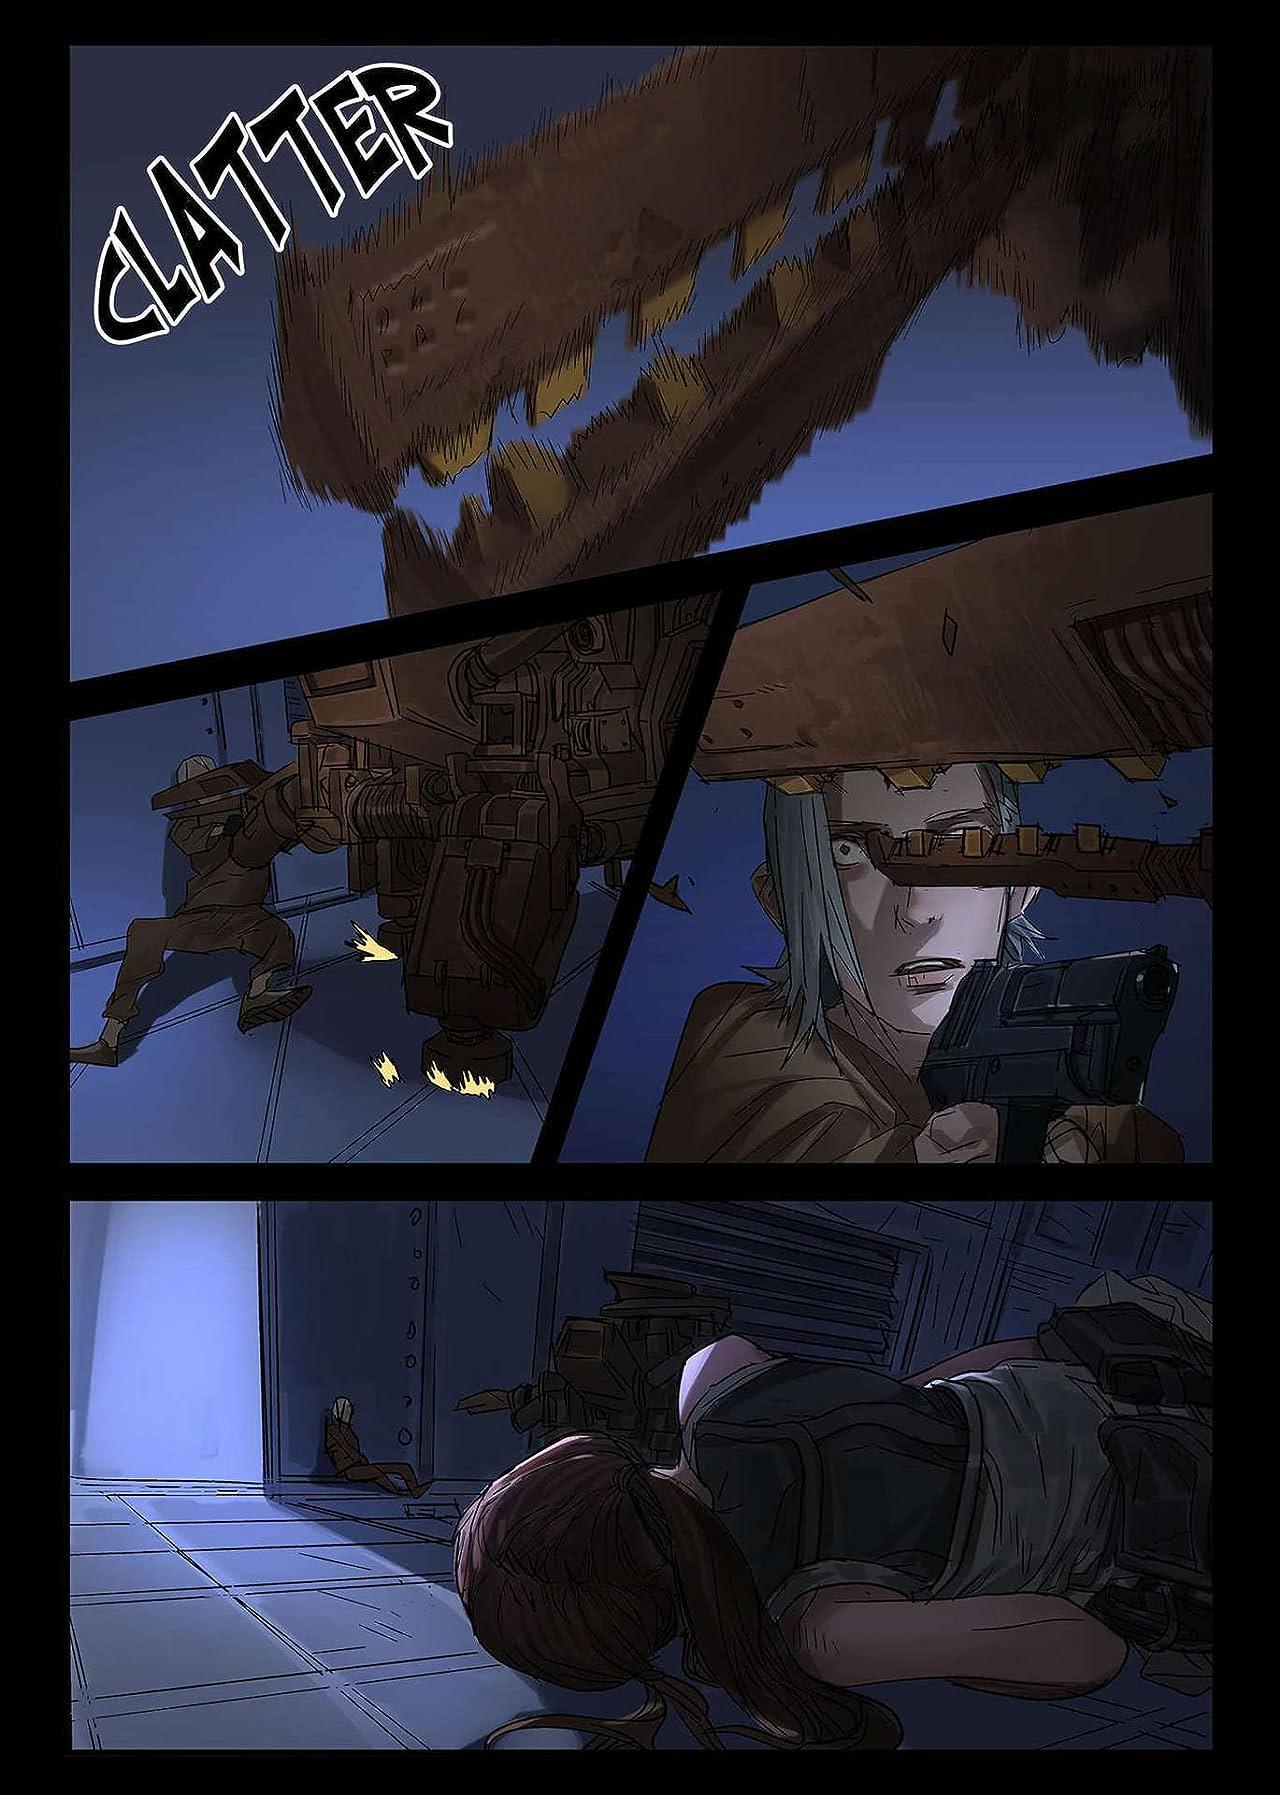 ARK #4